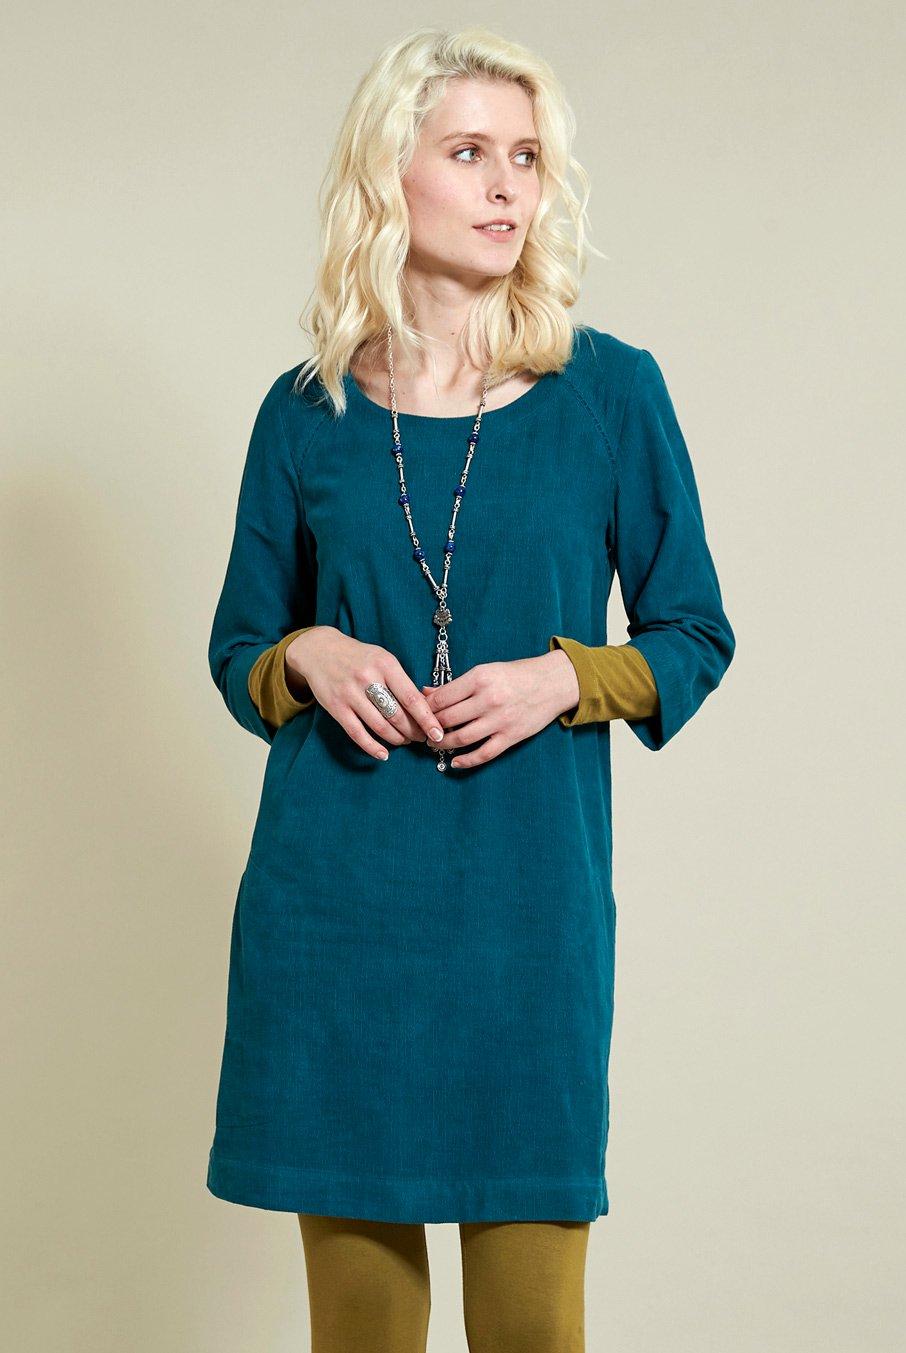 Manšestrové tunikové šaty modré ⋆ Green butik 2bdc45de77